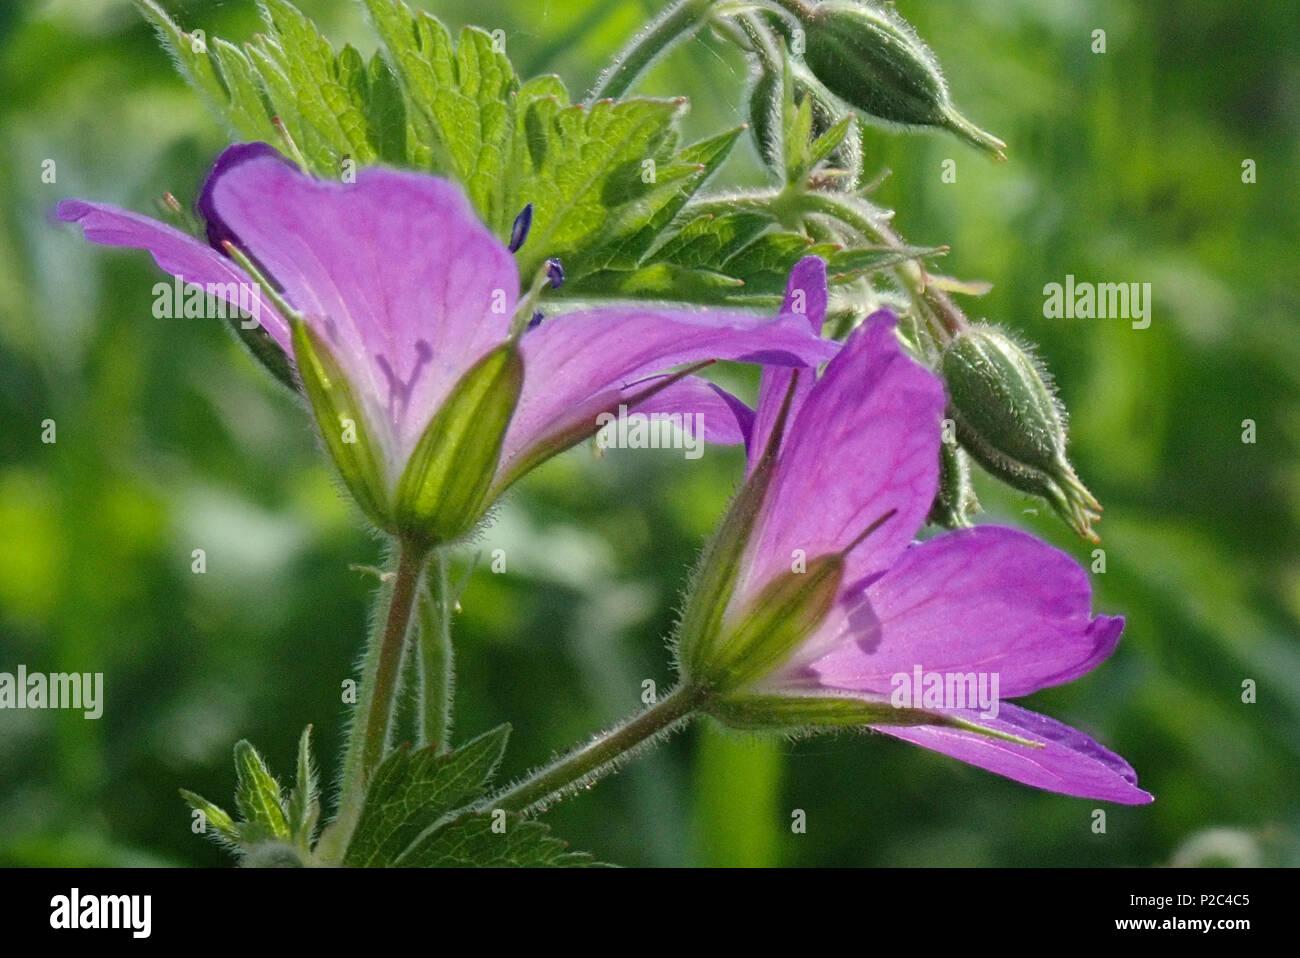 Geranium sylvaticum. Hausjärvi, Finland. 22.5.2018 - Stock Image